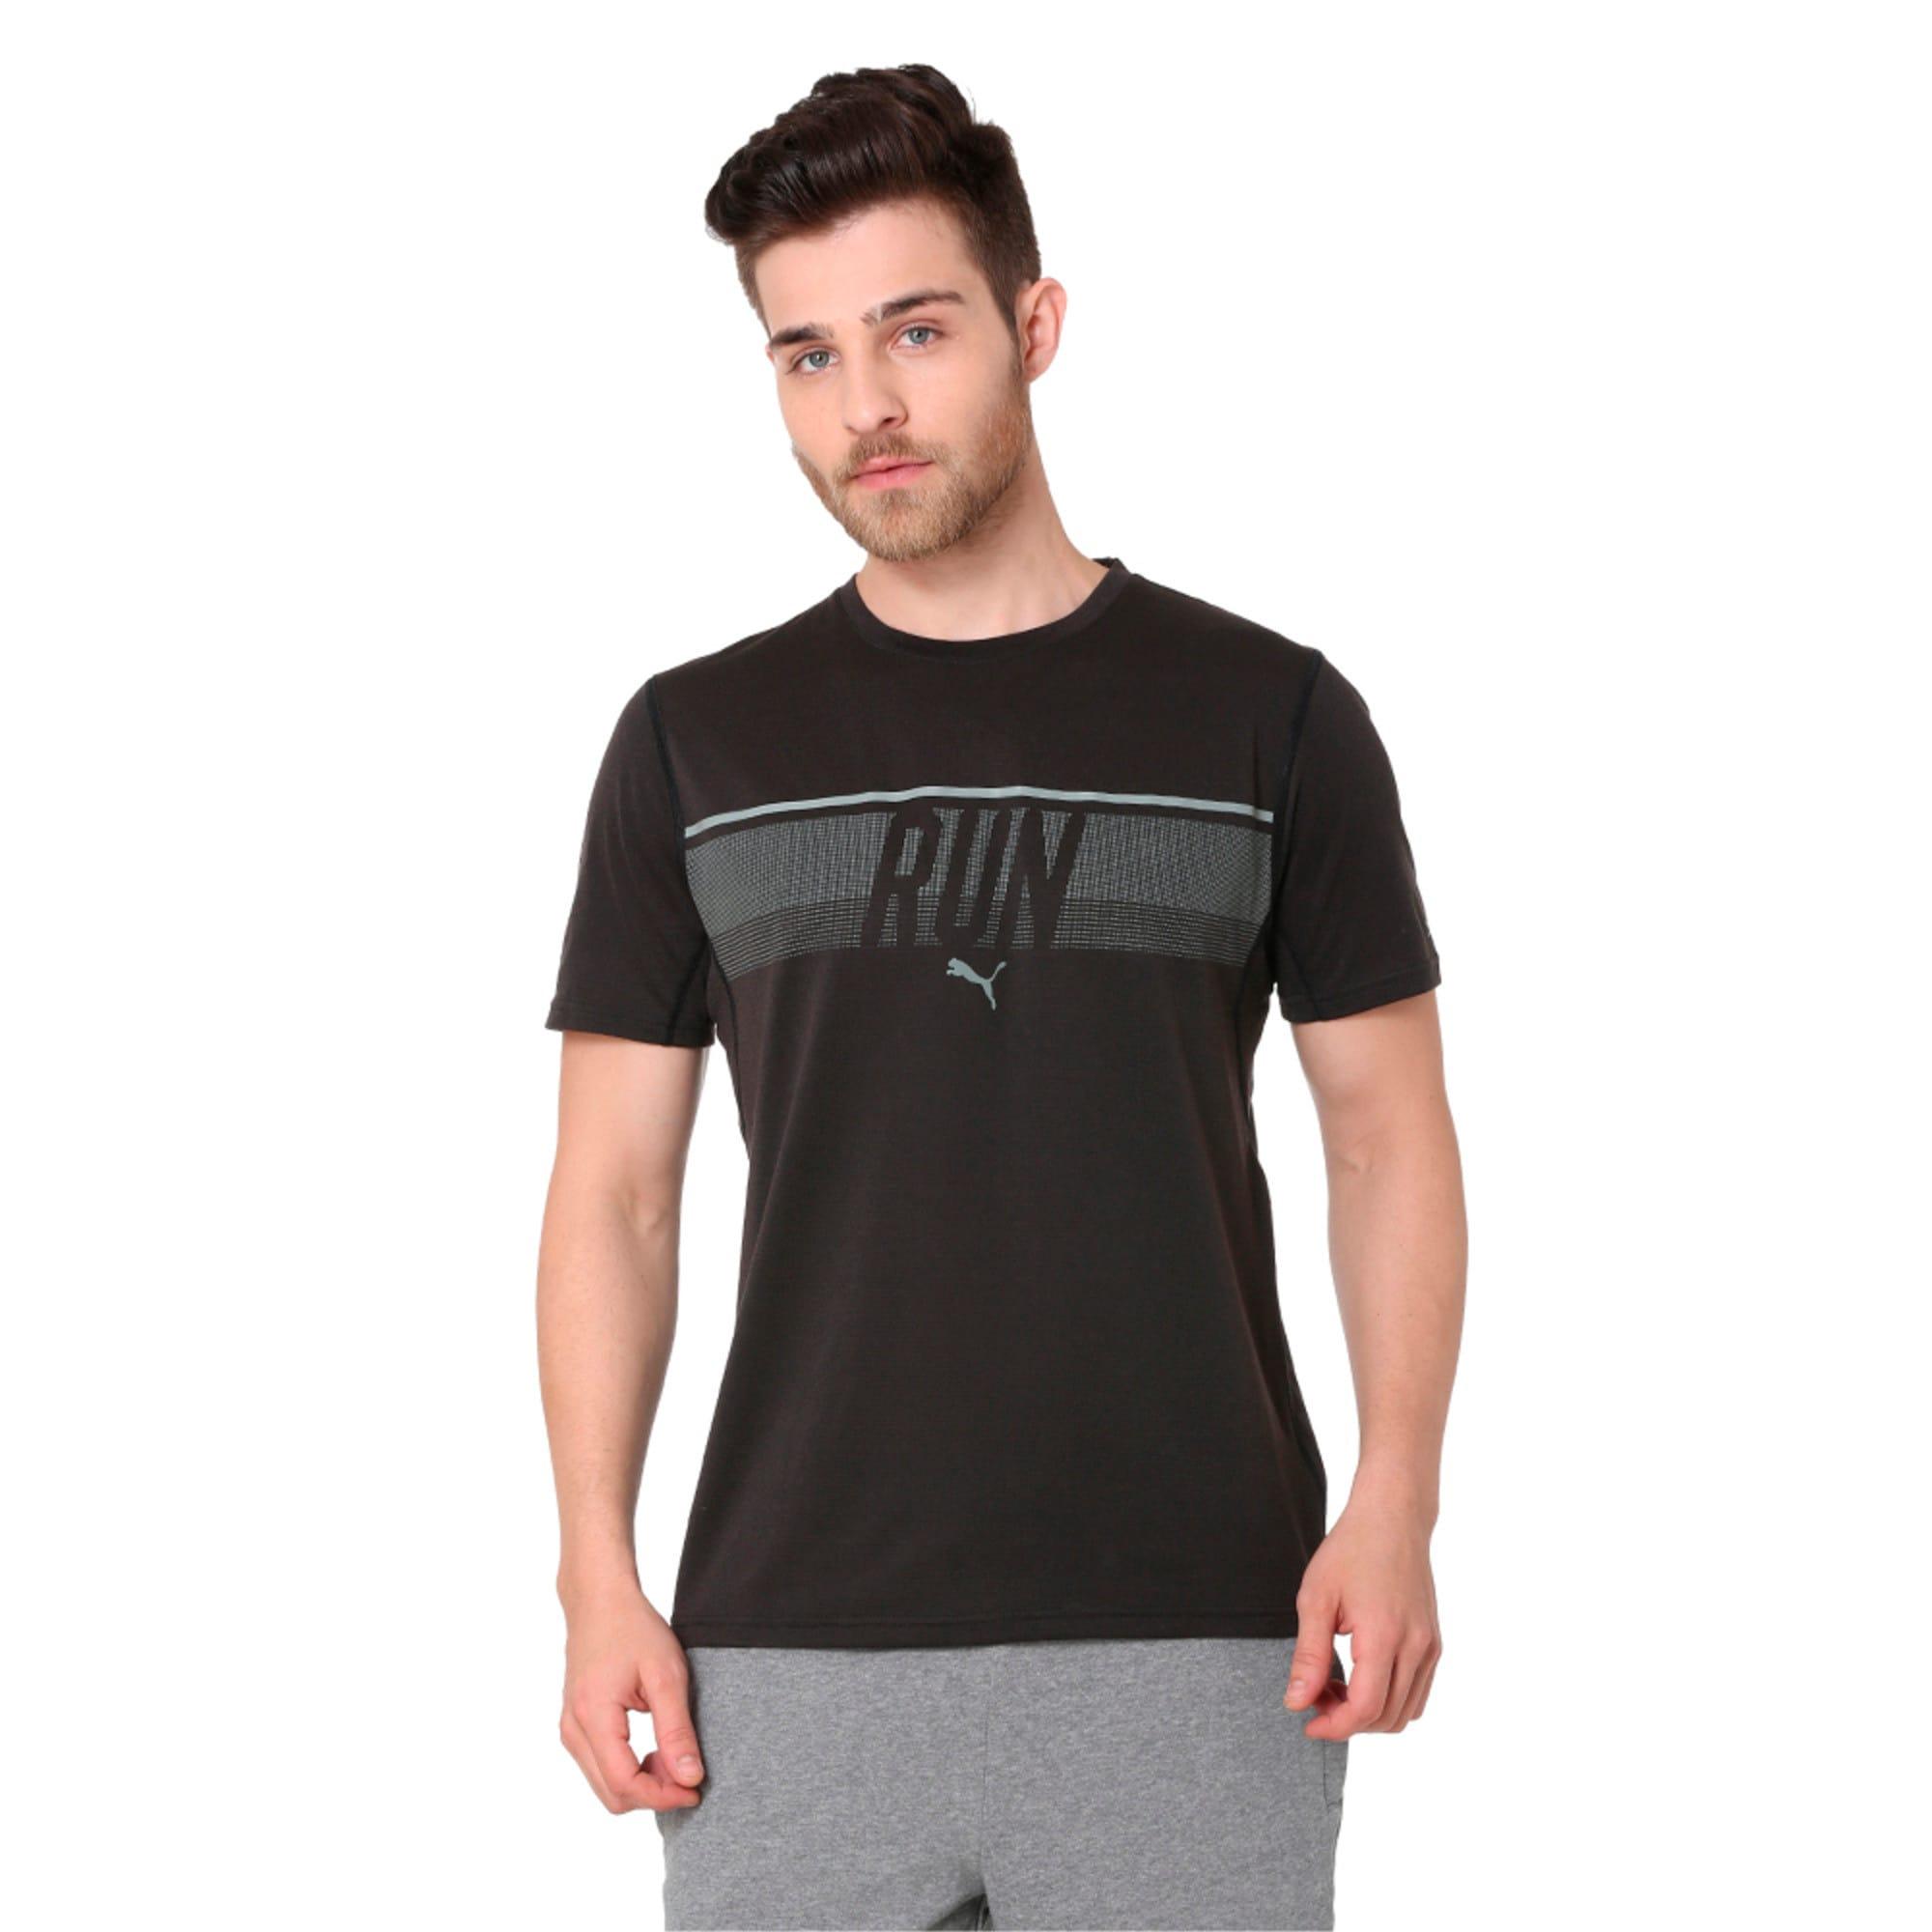 Thumbnail 1 of Run Men's Running T-Shirt, Puma Black, medium-IND